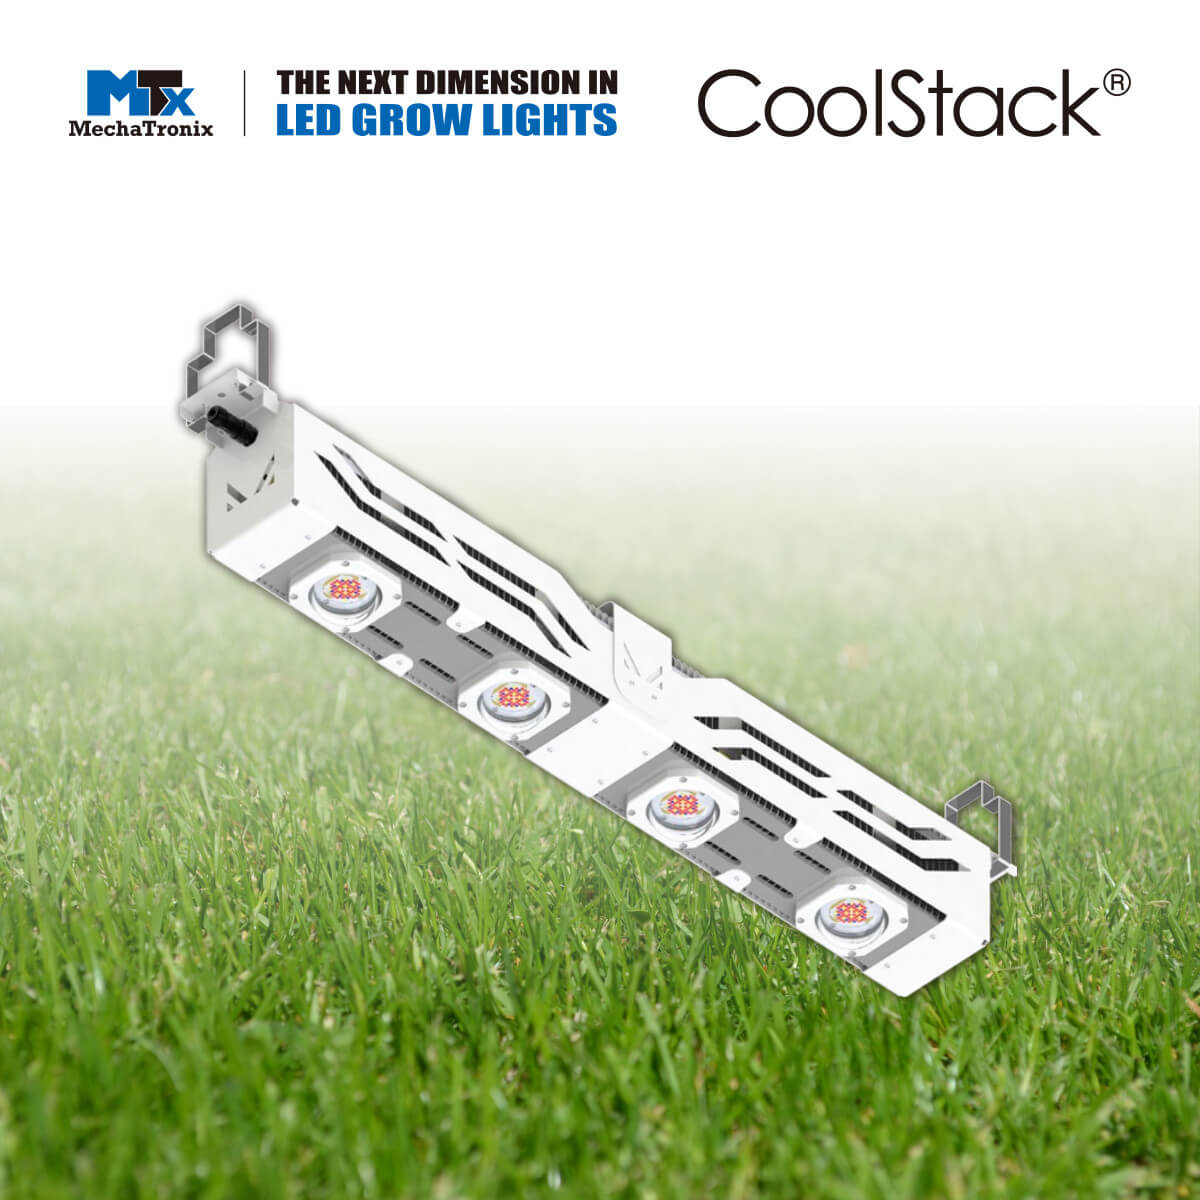 Mechatronix Coolstack 900x900 v3